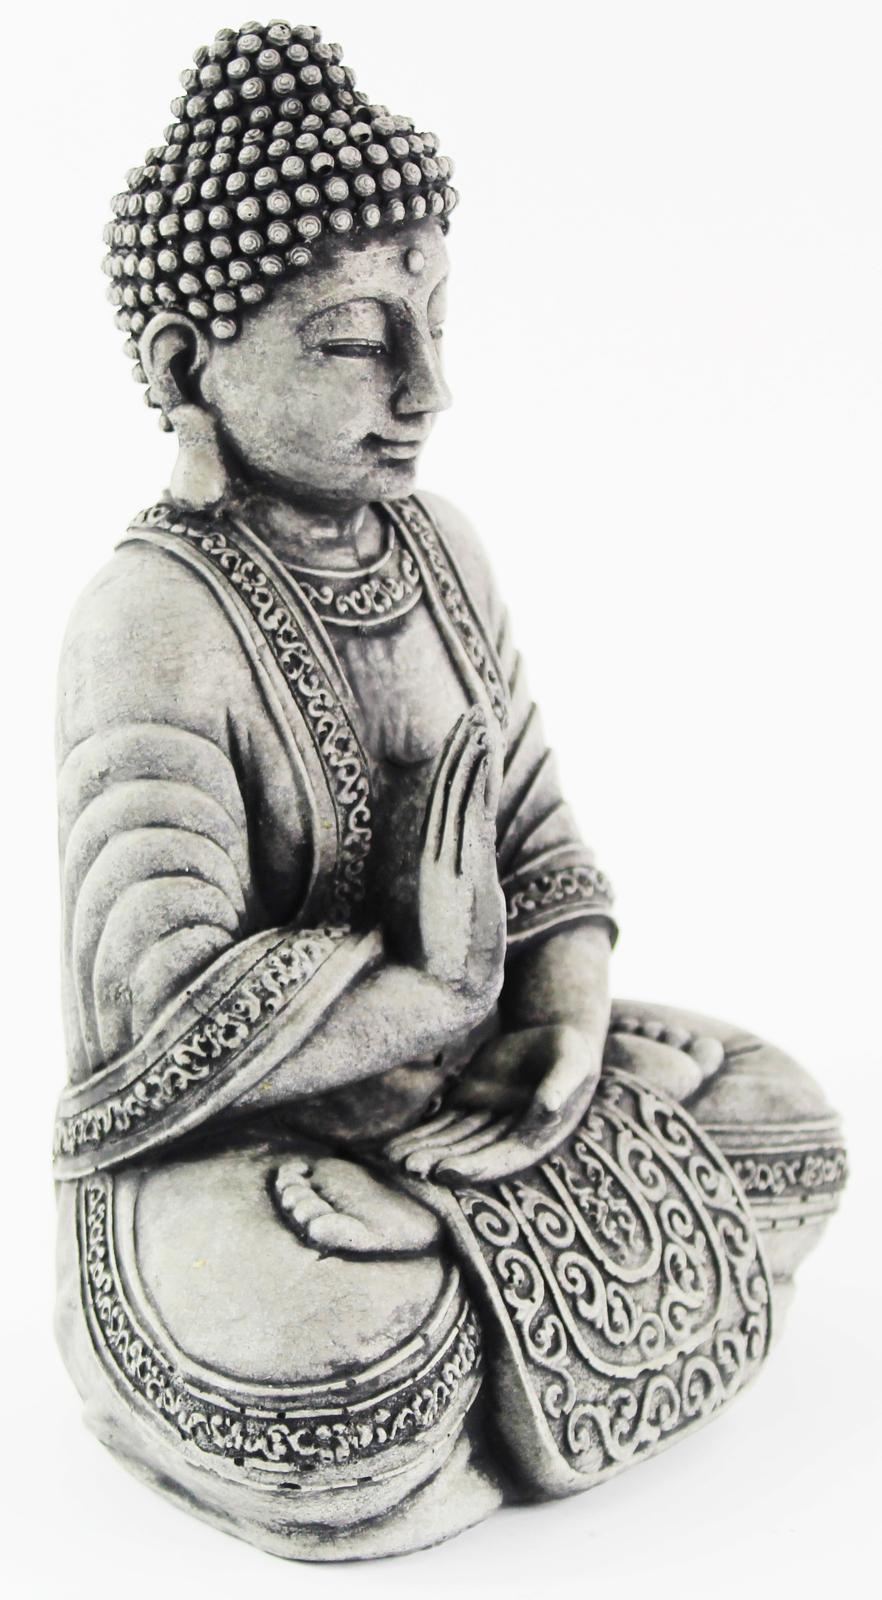 Meditating Sitting Cement Buddha Concrete Statue